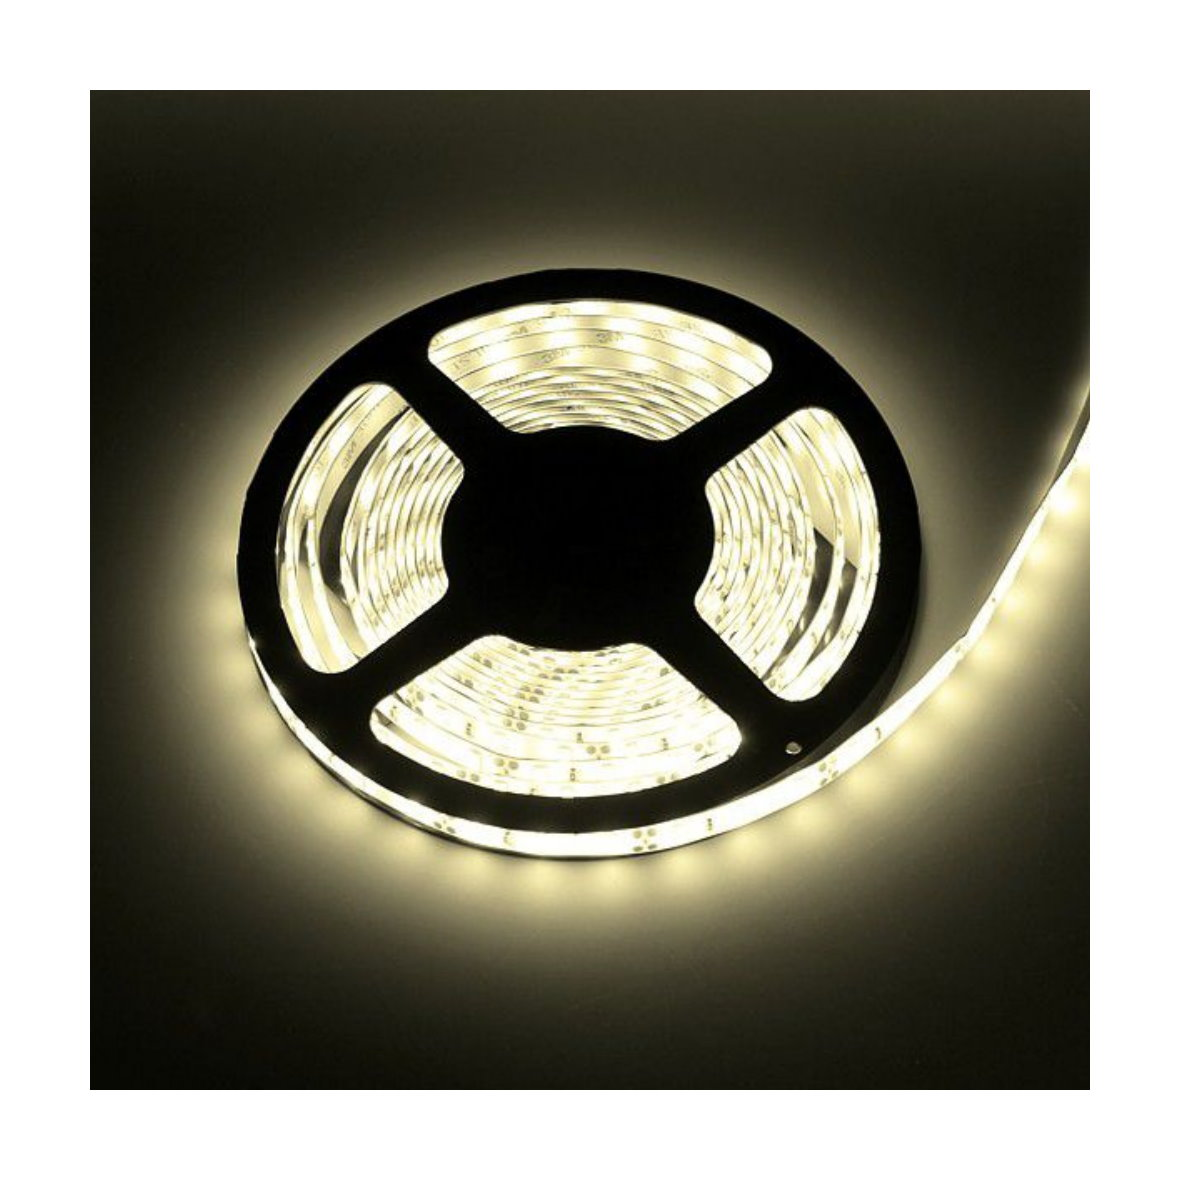 5m 300 led smd lichtband licht strip leiste band streifen 3528 5630 rgb dimmbar ebay. Black Bedroom Furniture Sets. Home Design Ideas